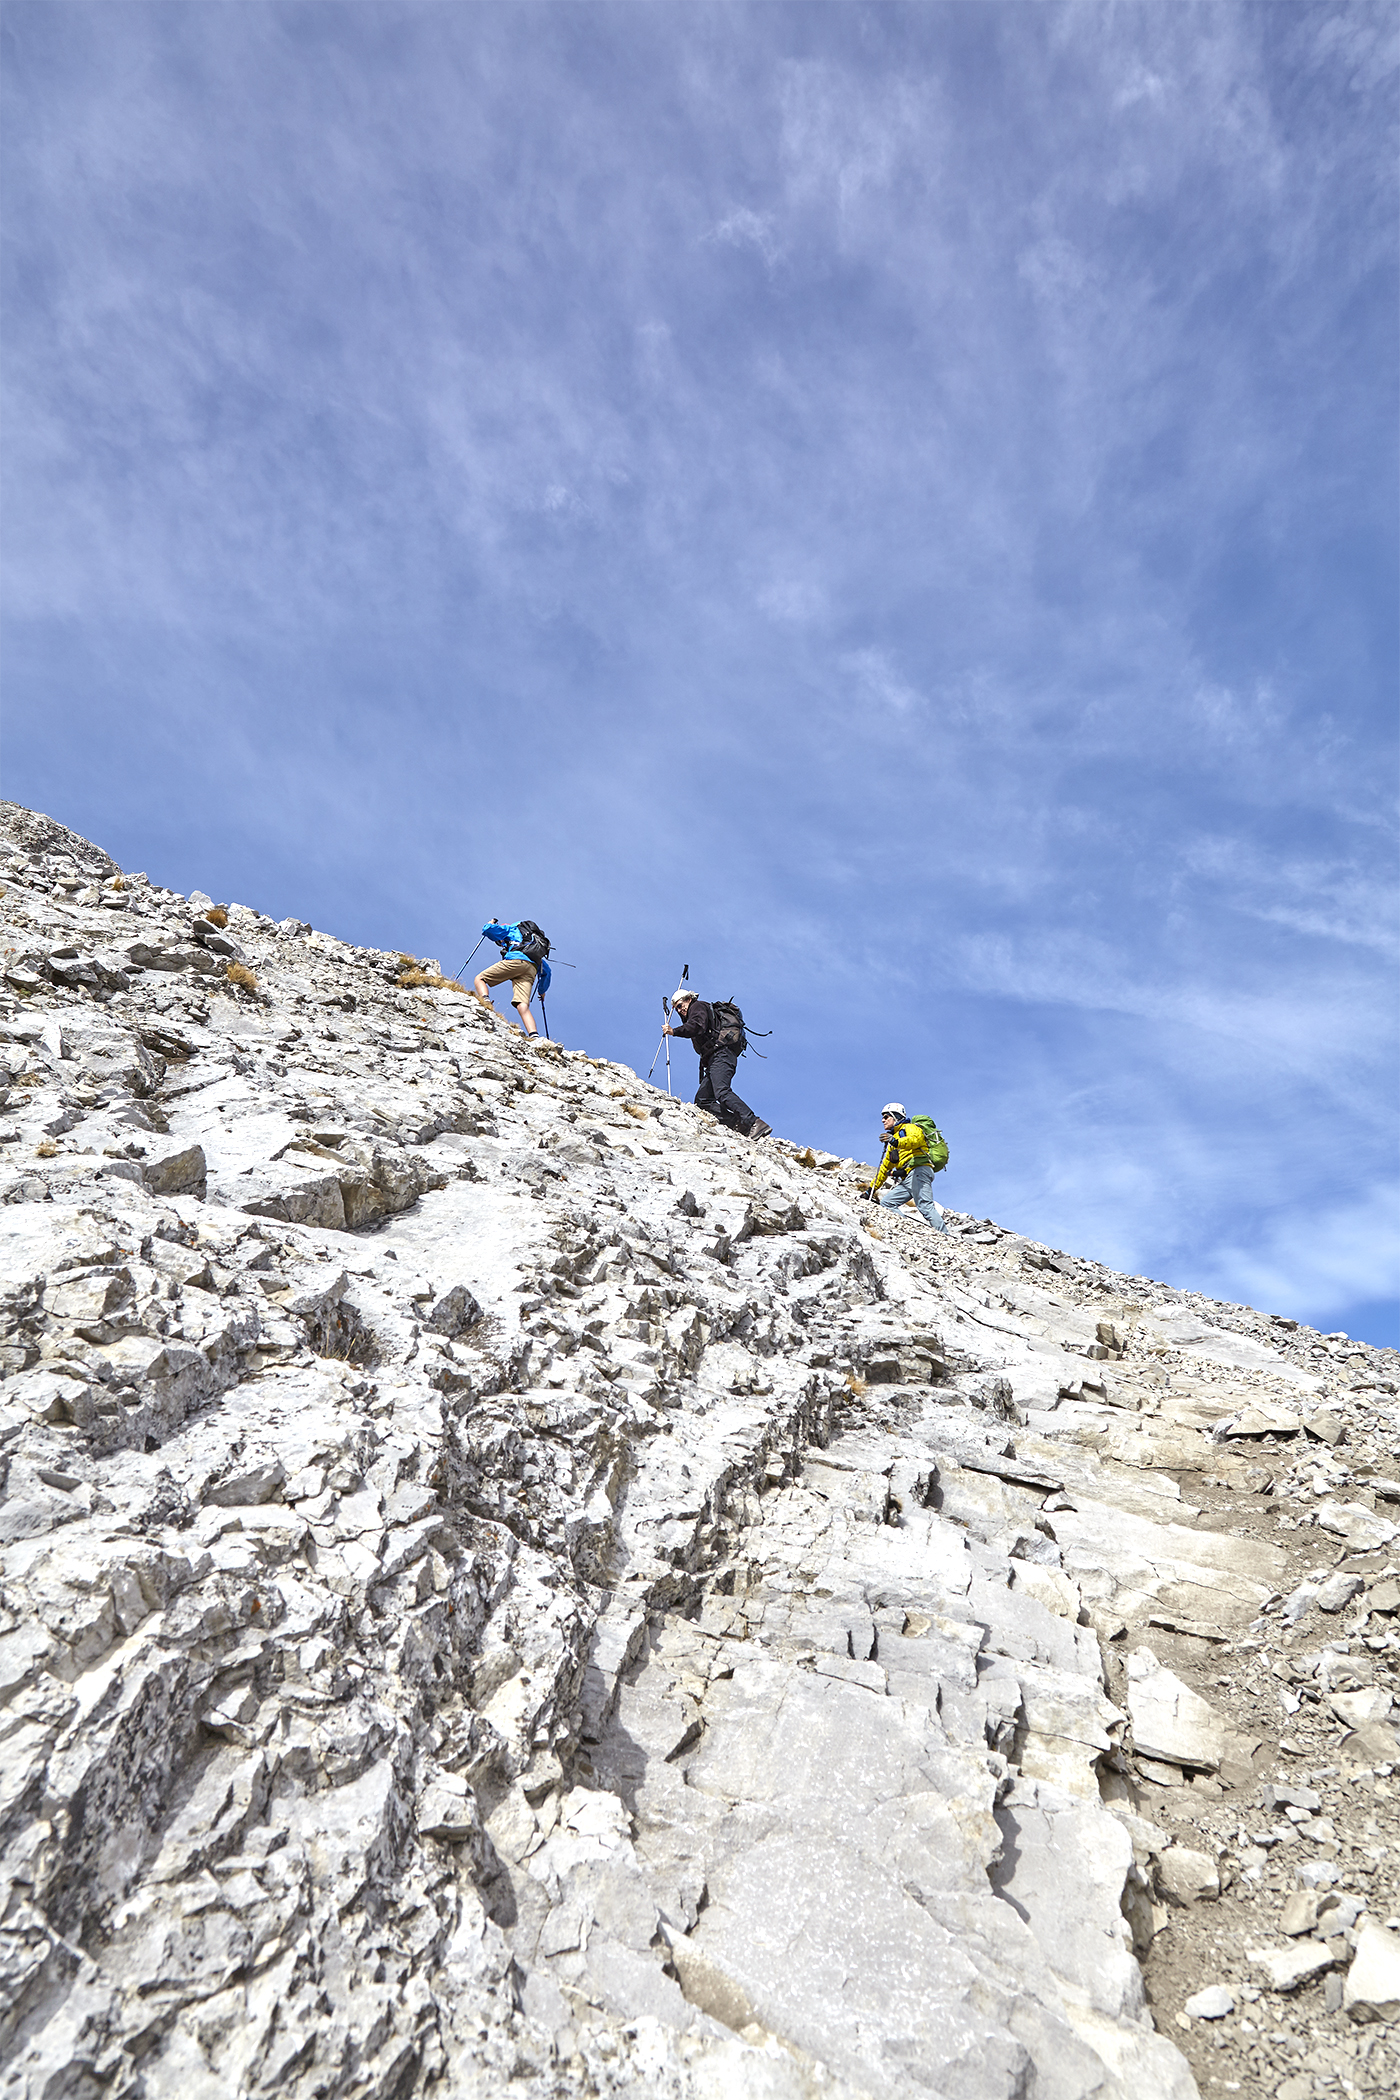 Yuri, Wayne, and Milan scale a steep slab near the summit.